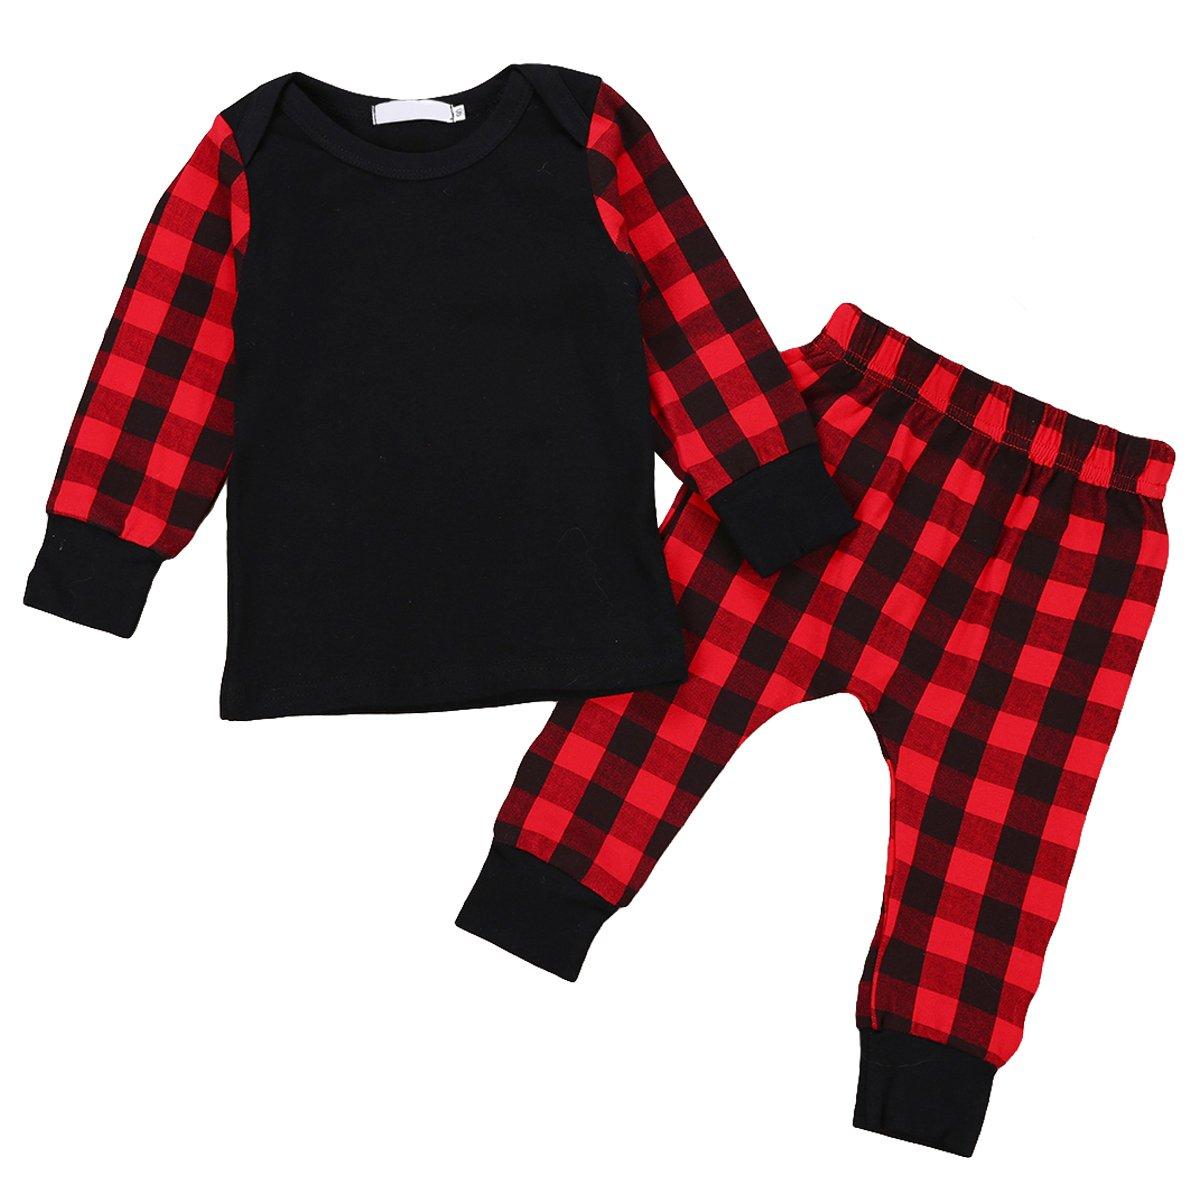 GRNSHTS Baby Girls Boys Plaid Outfits Long Sleeve Tops + Pants Sets Pajamas Set